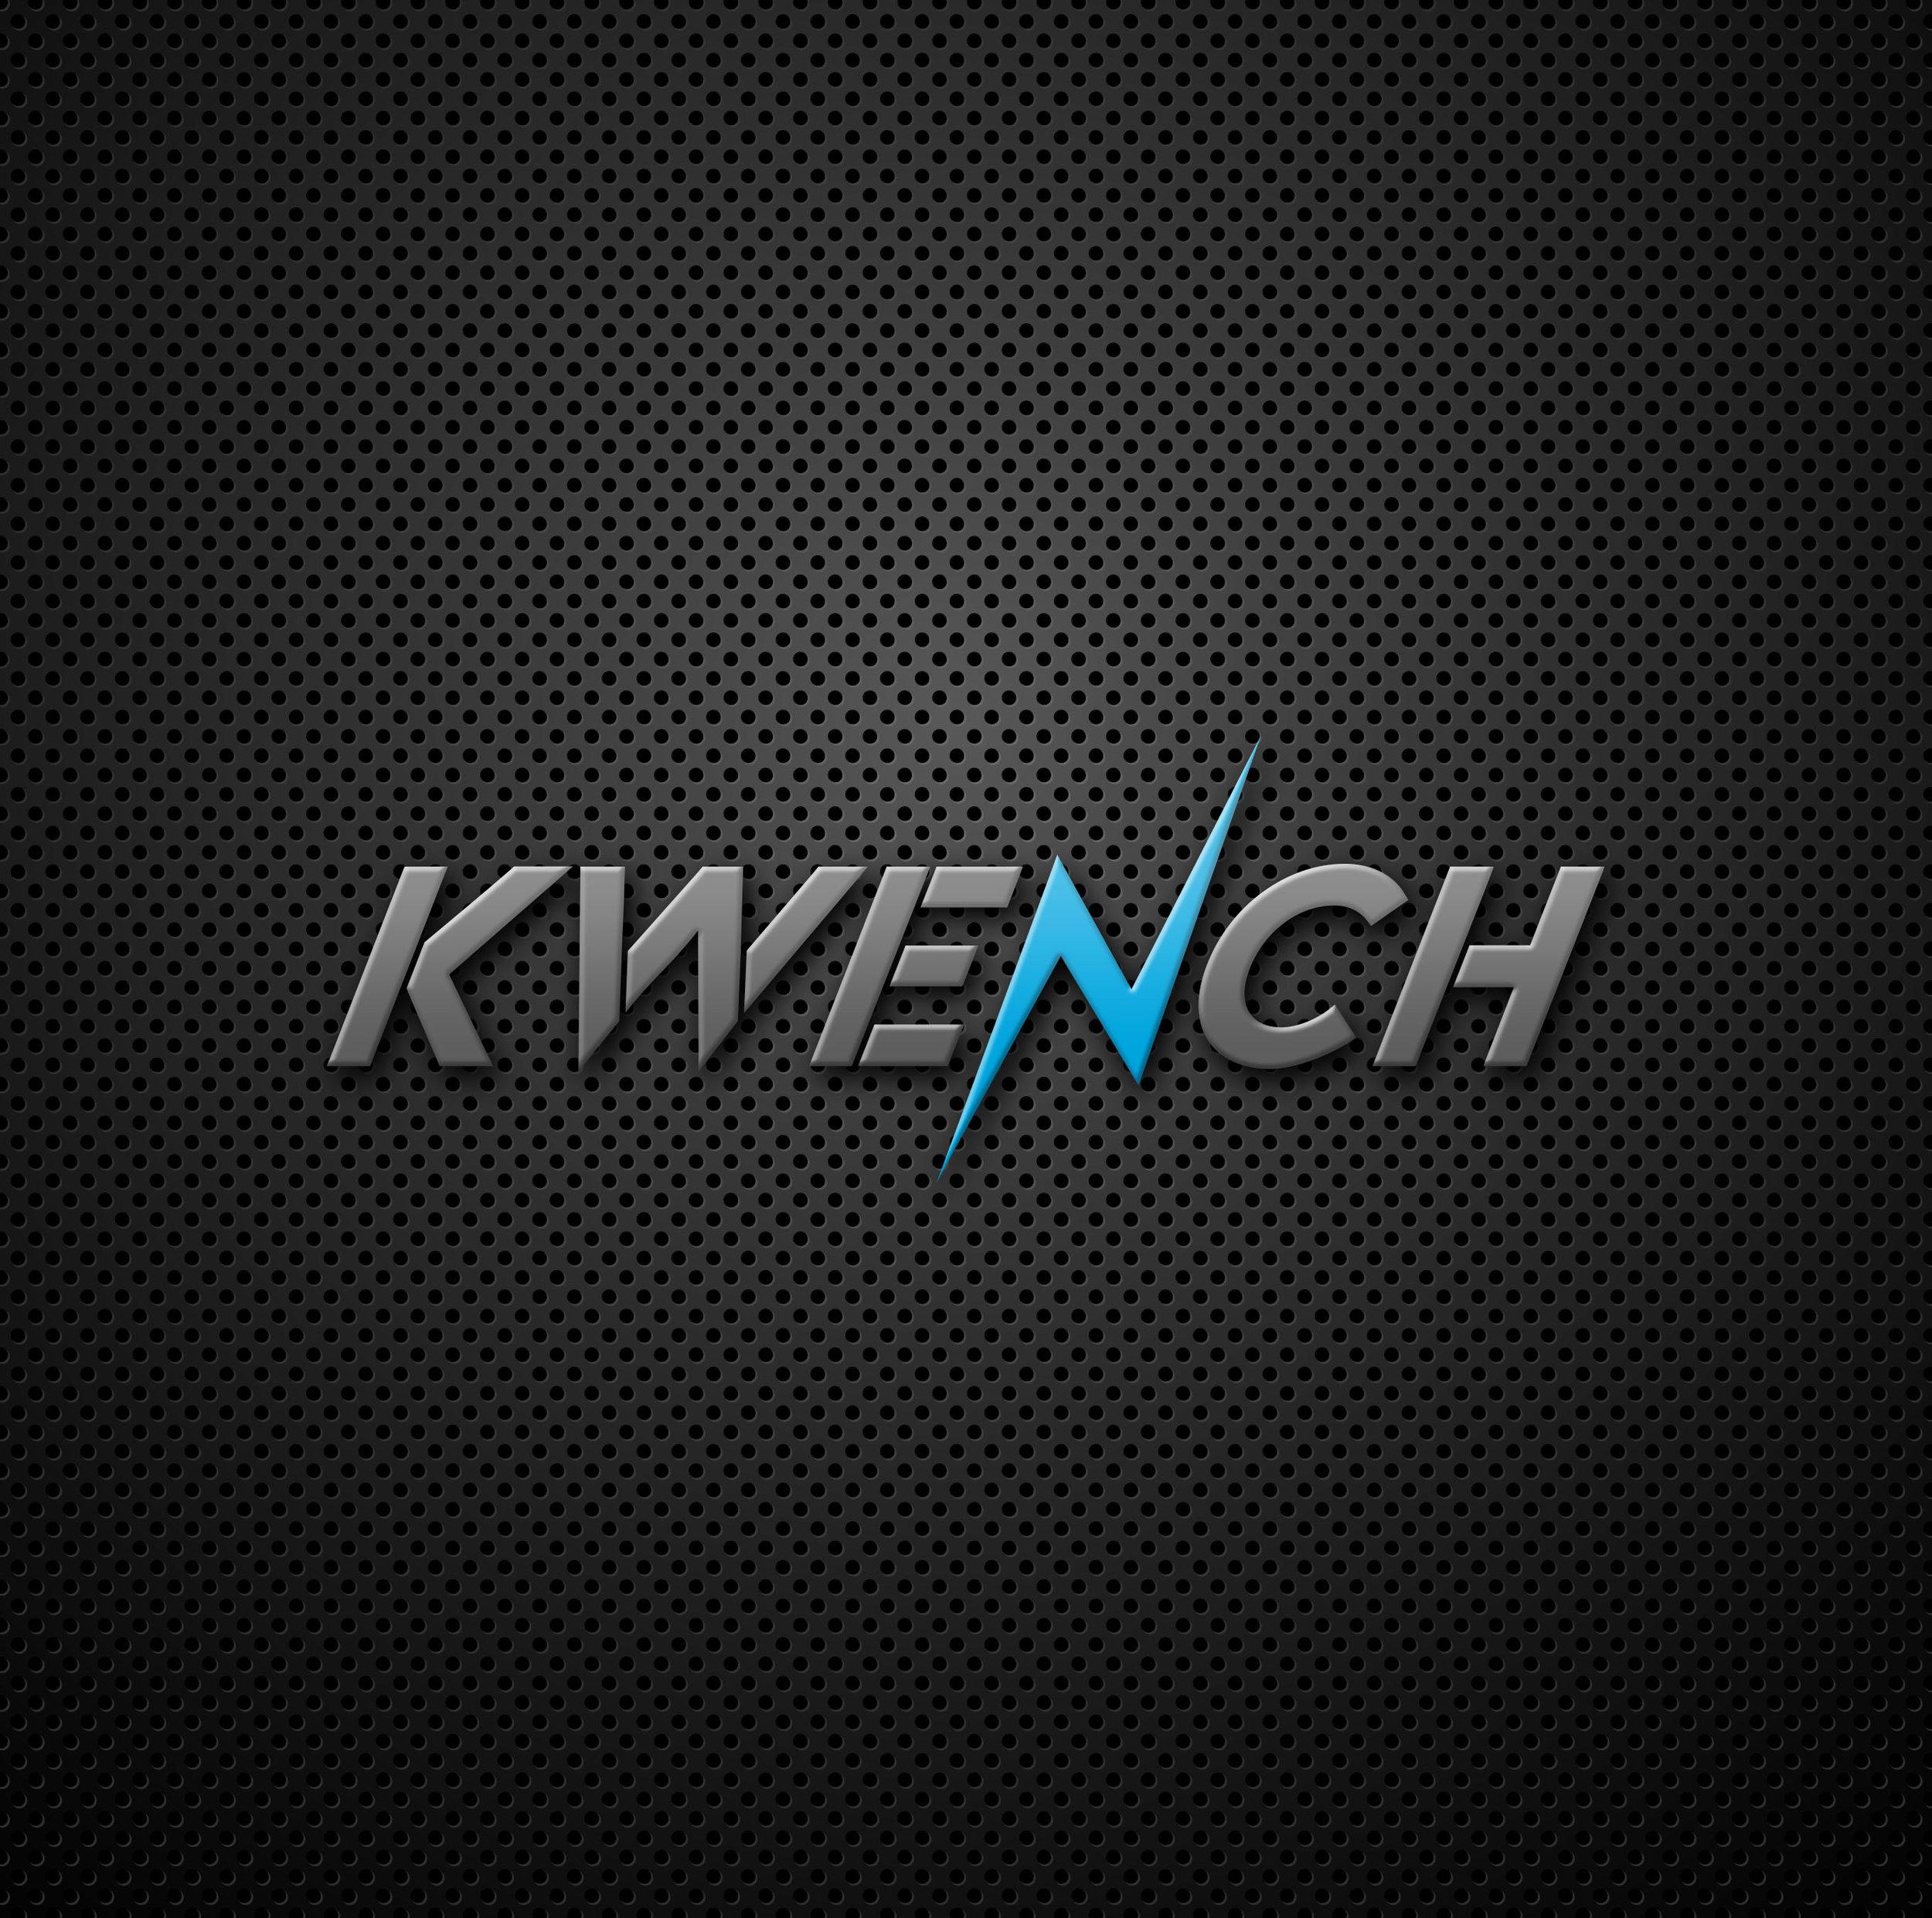 kwench logo mockup.jpg